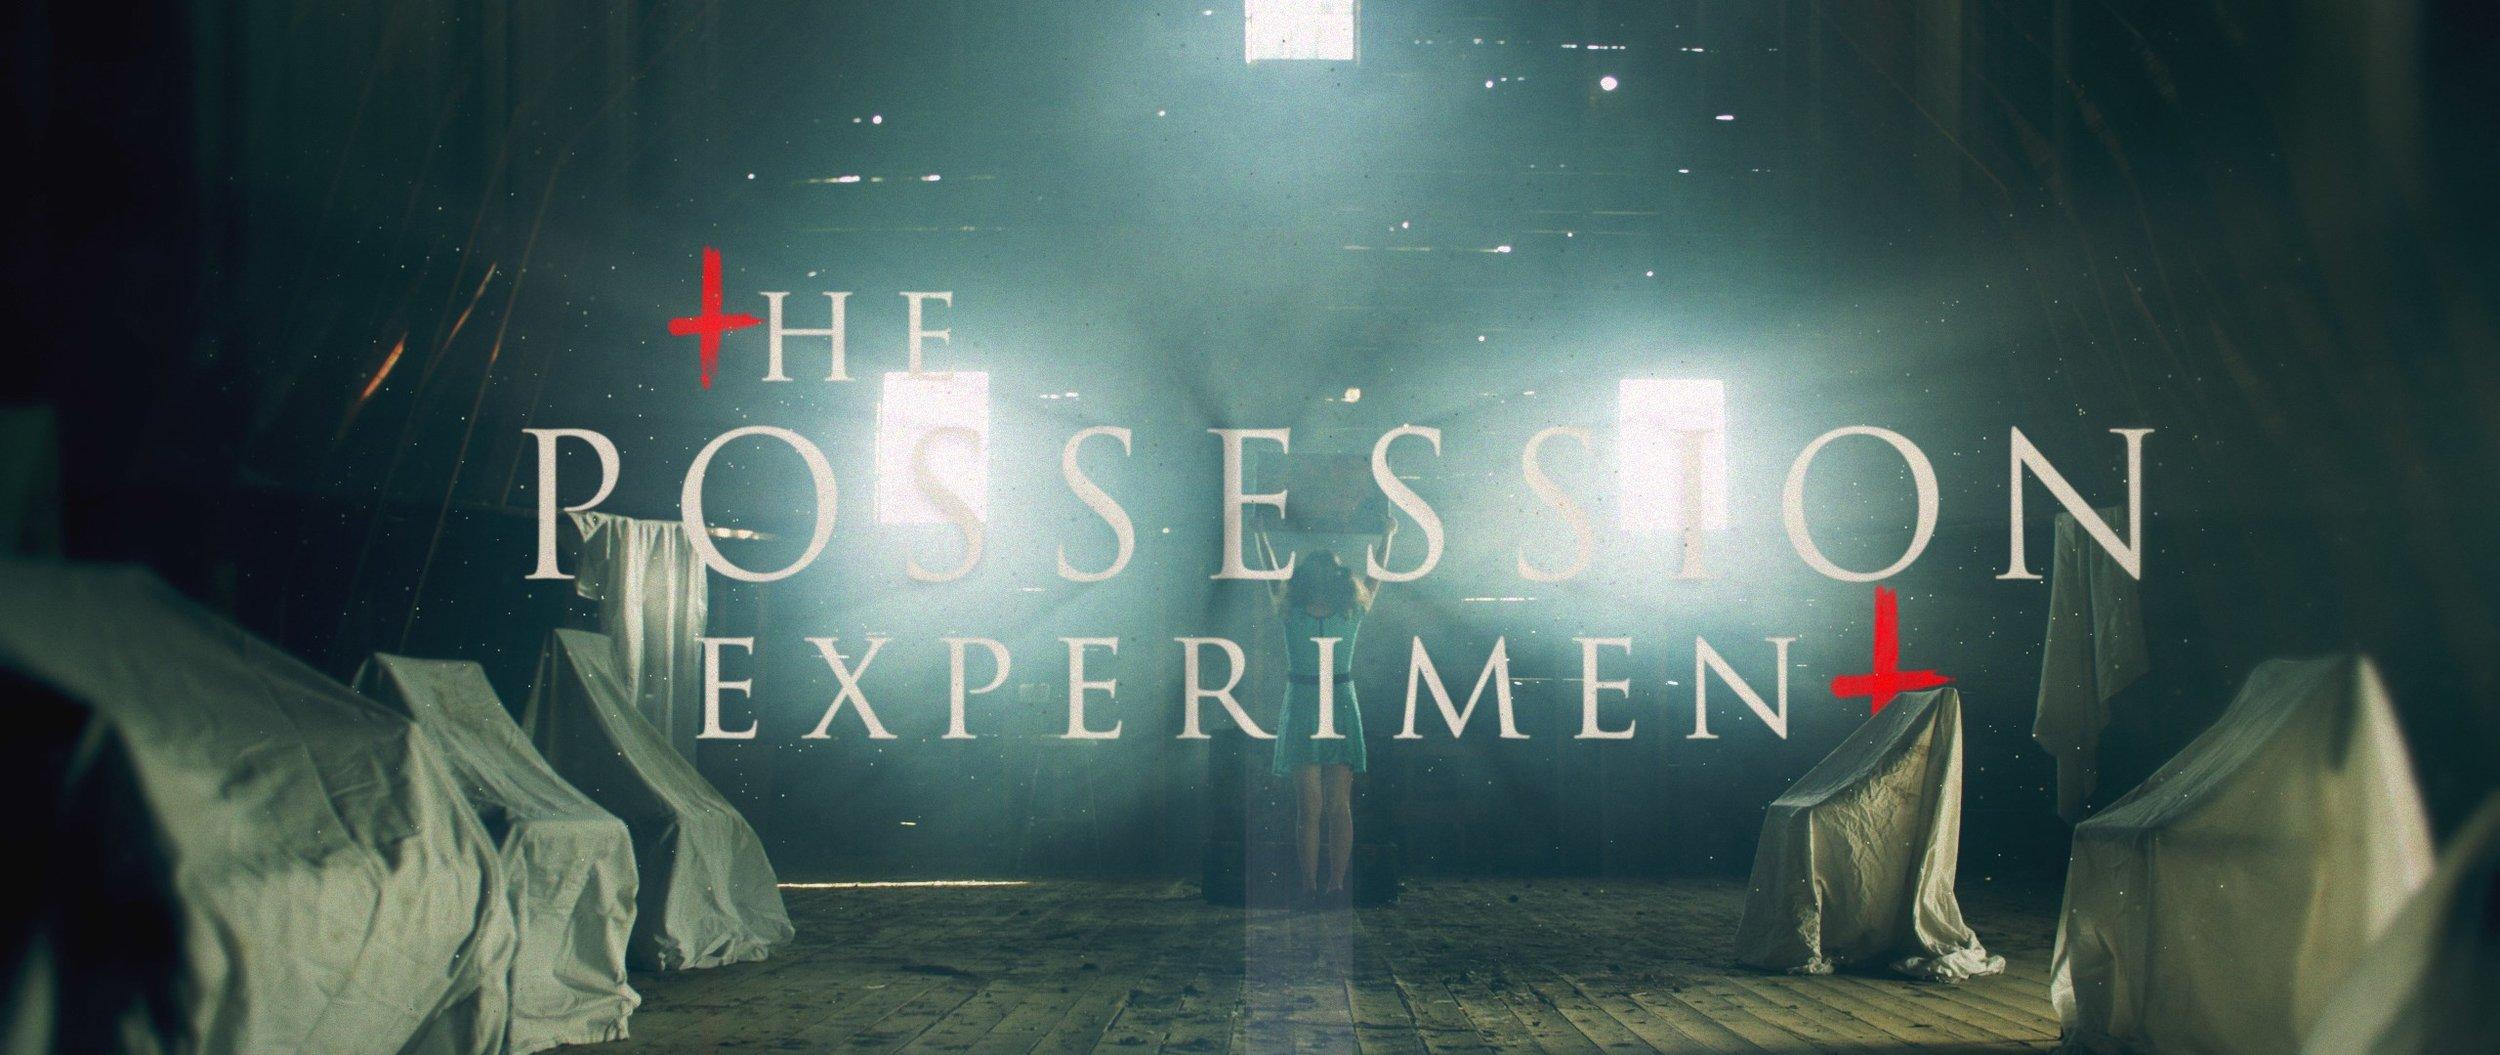 The Possesion Experiment 11.jpg